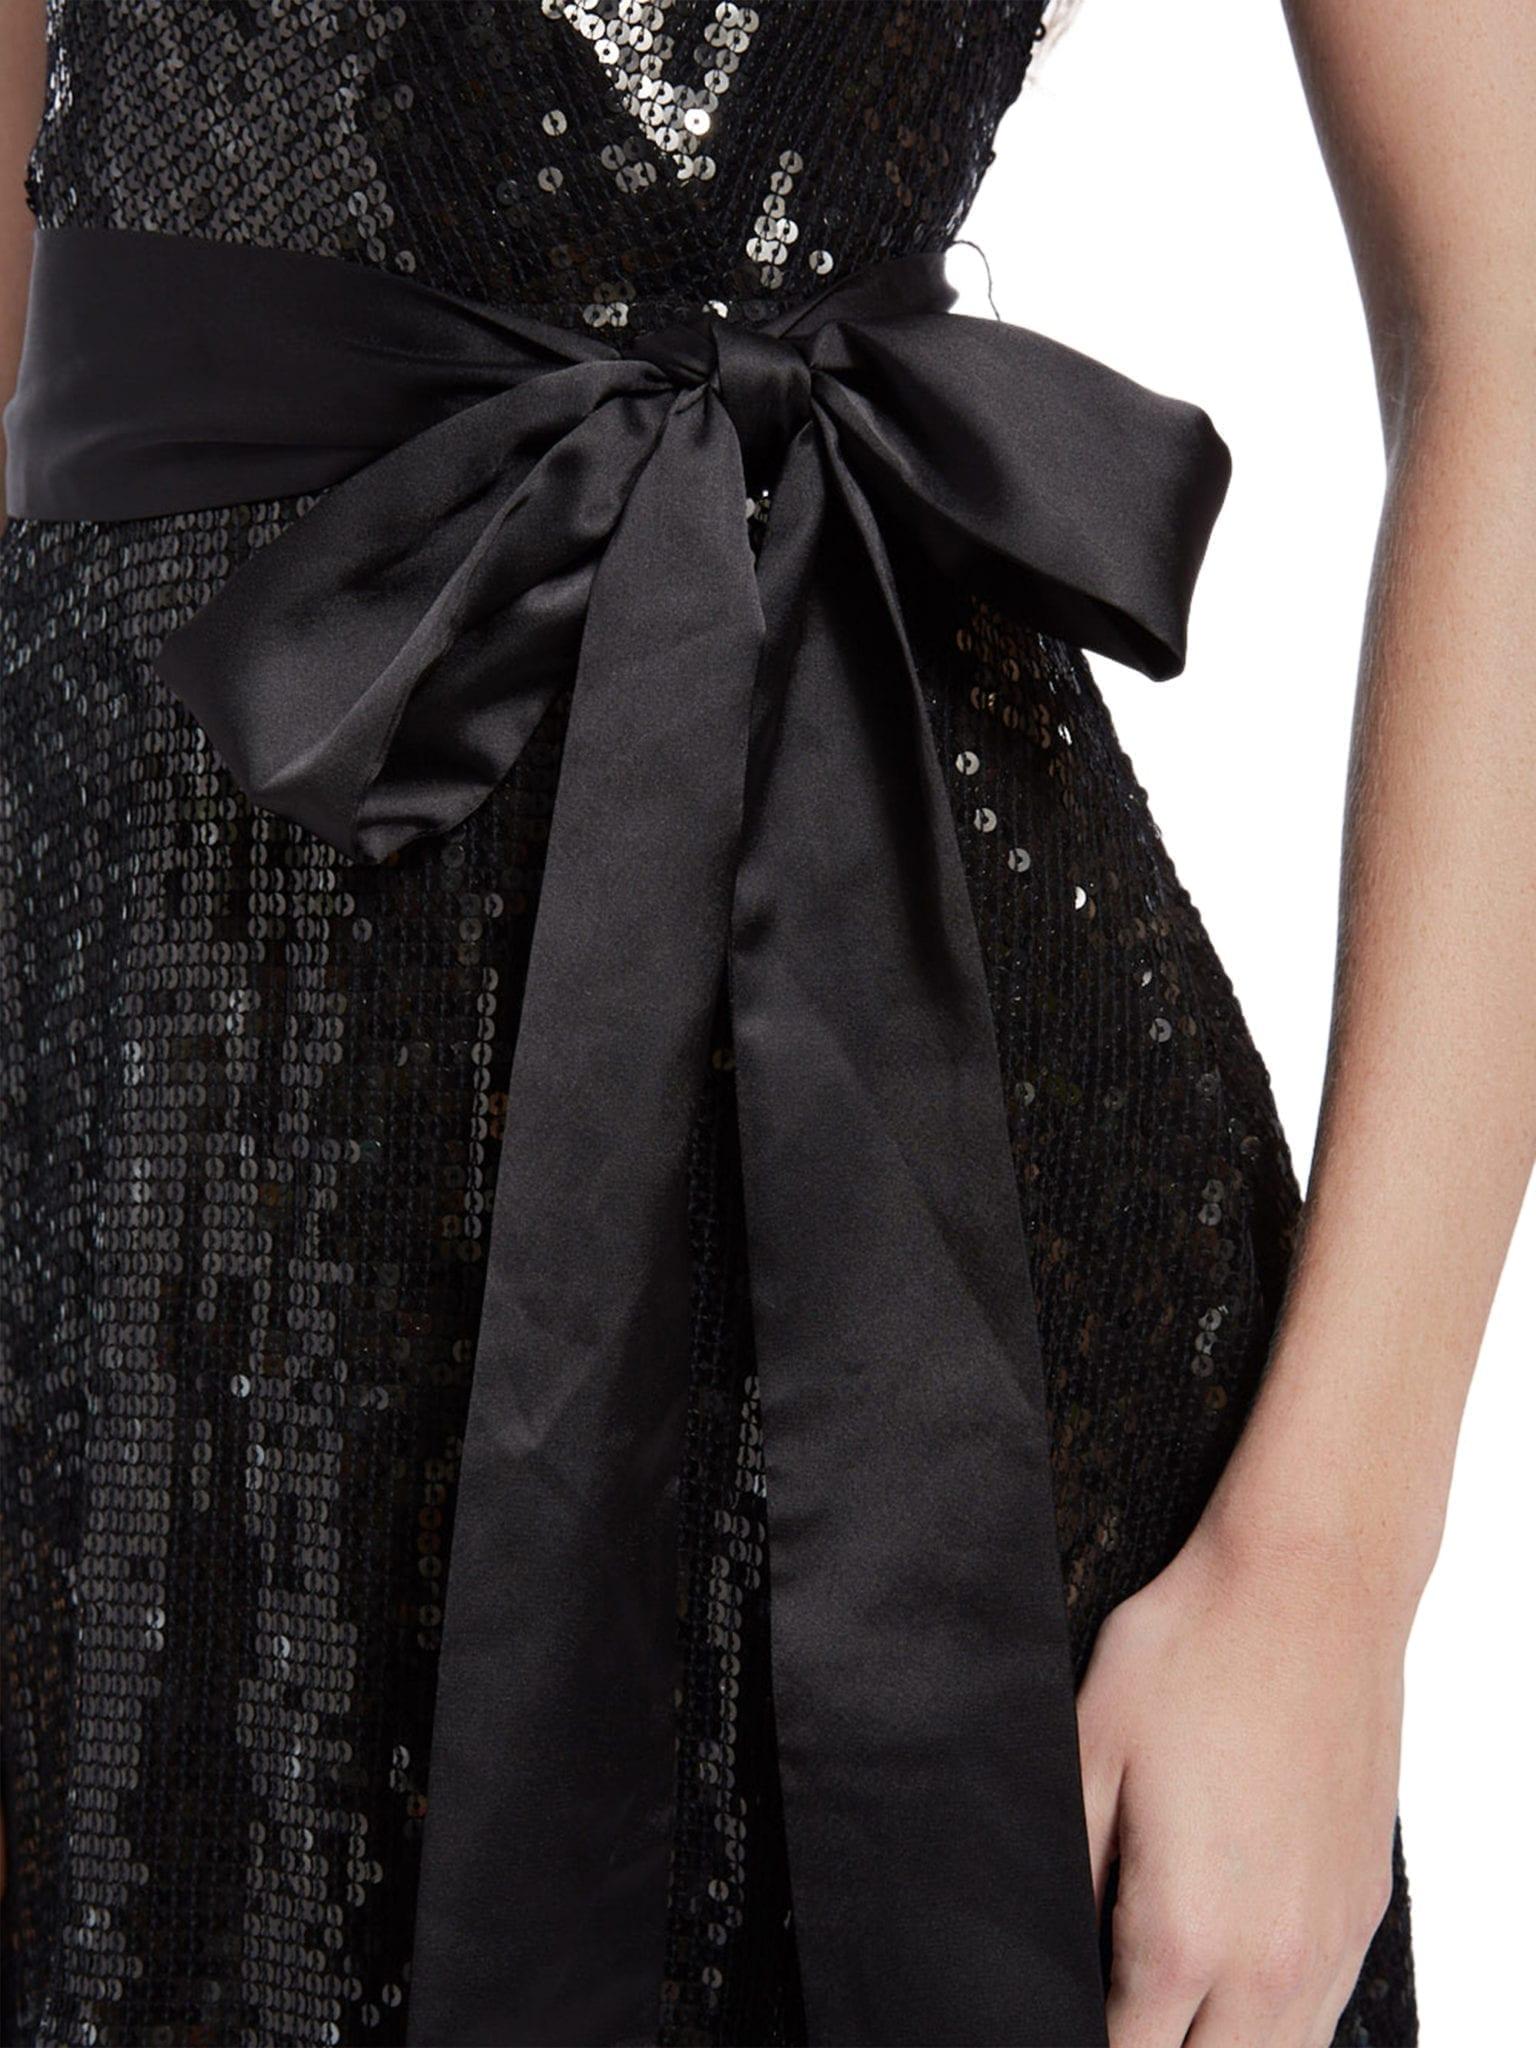 9ba4099f10 Alice + Olivia Bayley Sequin Mini Black Dress - We Select Dresses